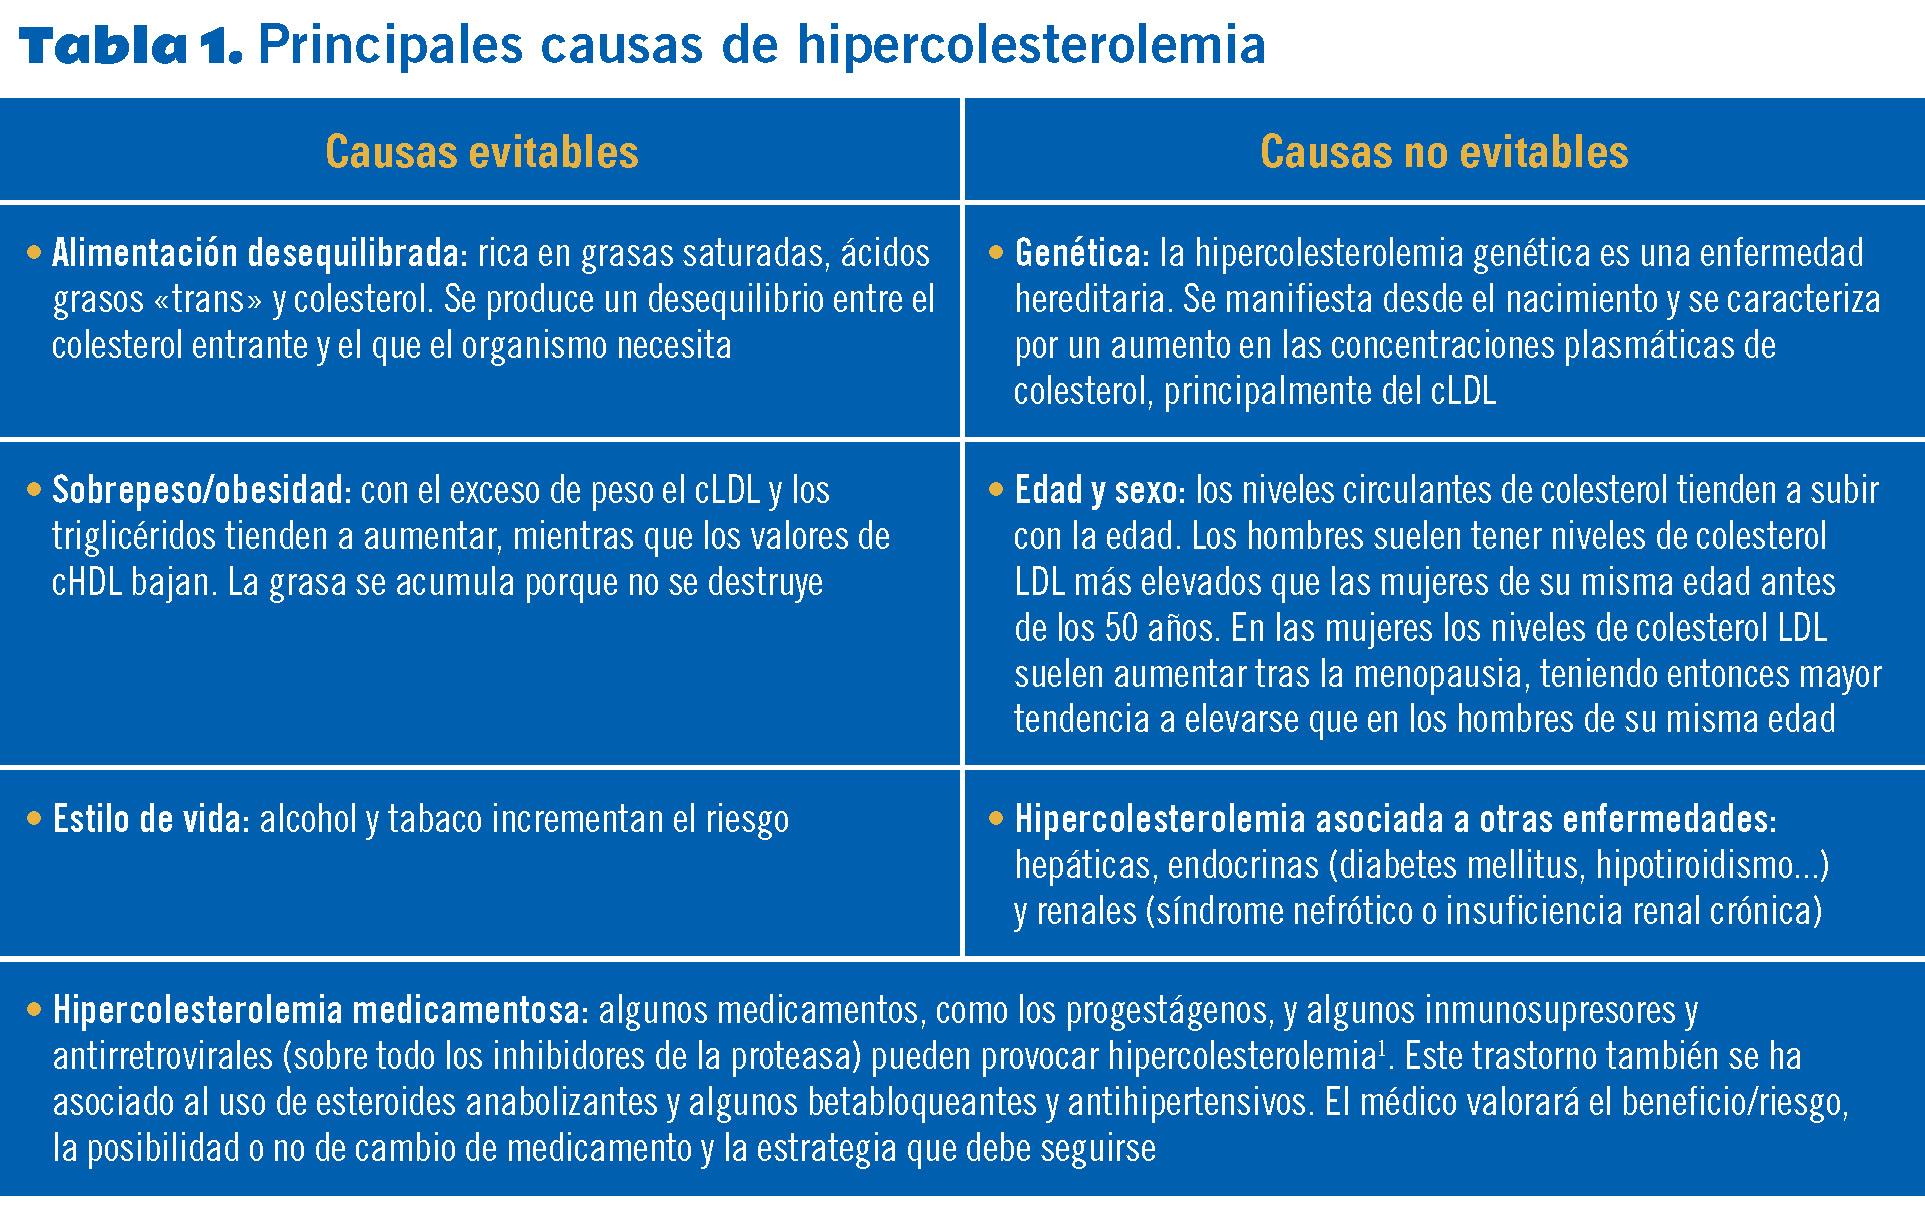 23 EF575 PROTOCOLOS hiperlipidemias tabla 1